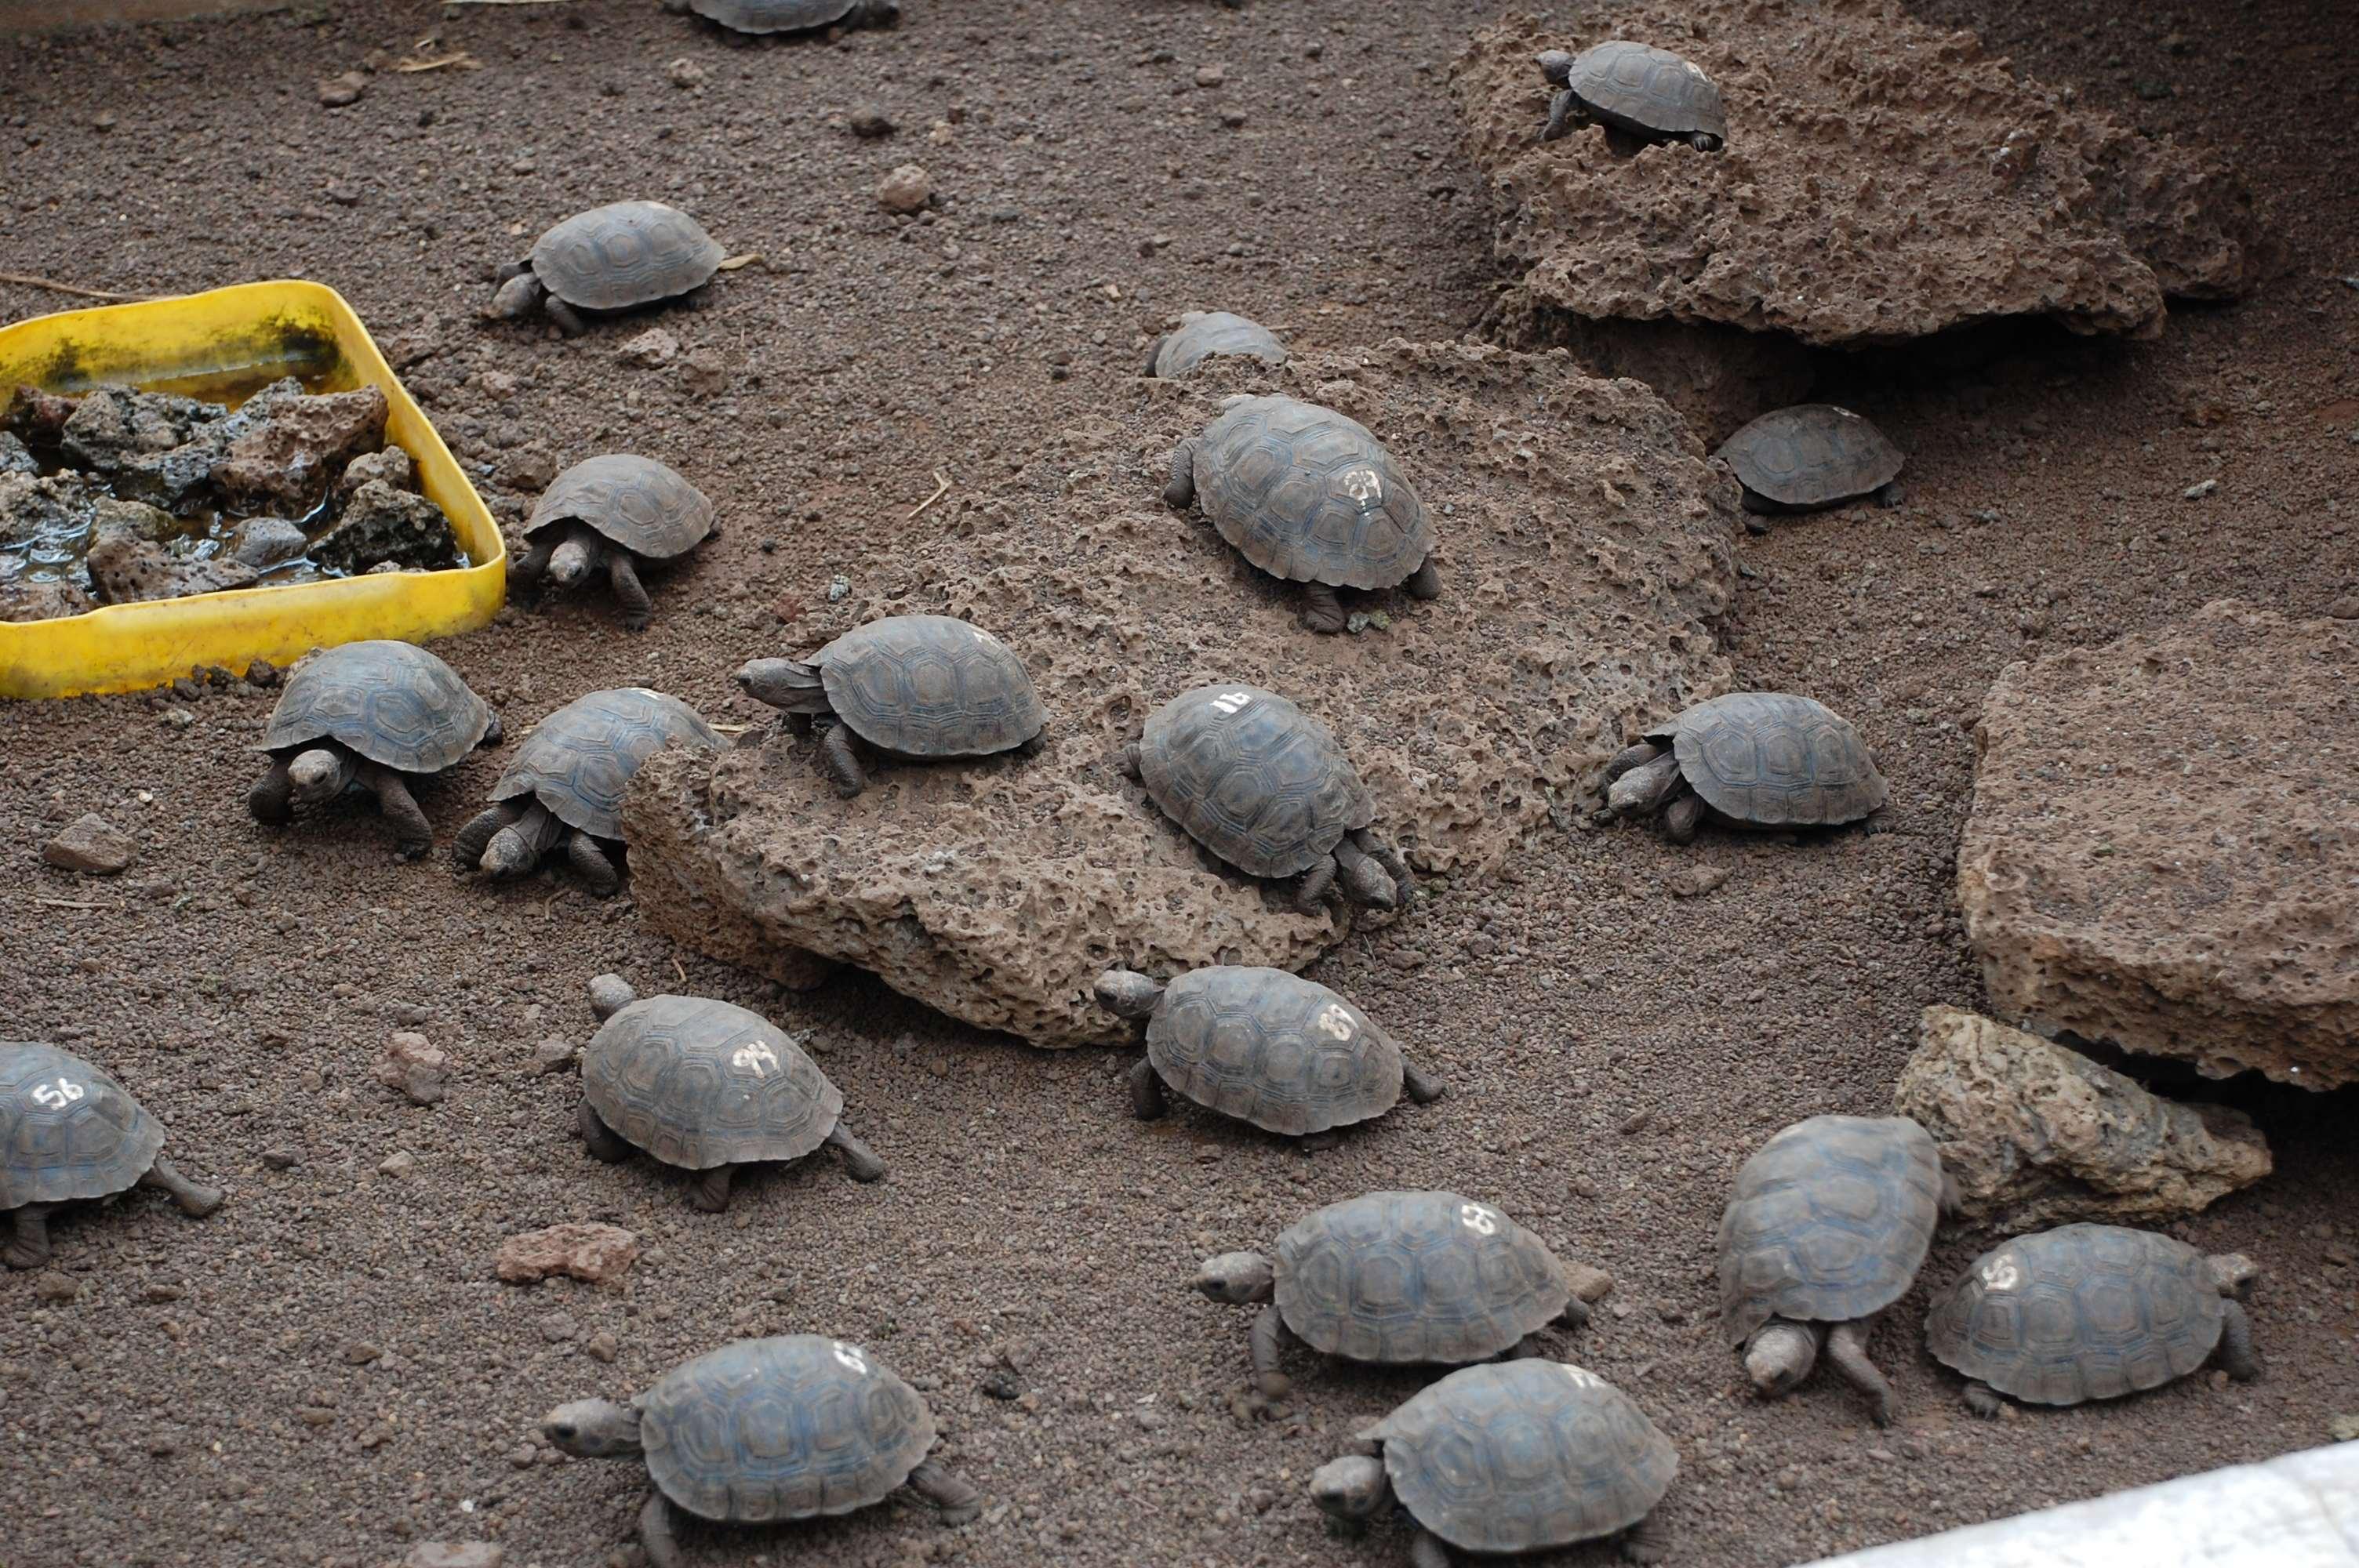 Galapagos Tortoise hatchlings being raised in their pens at Tortoise